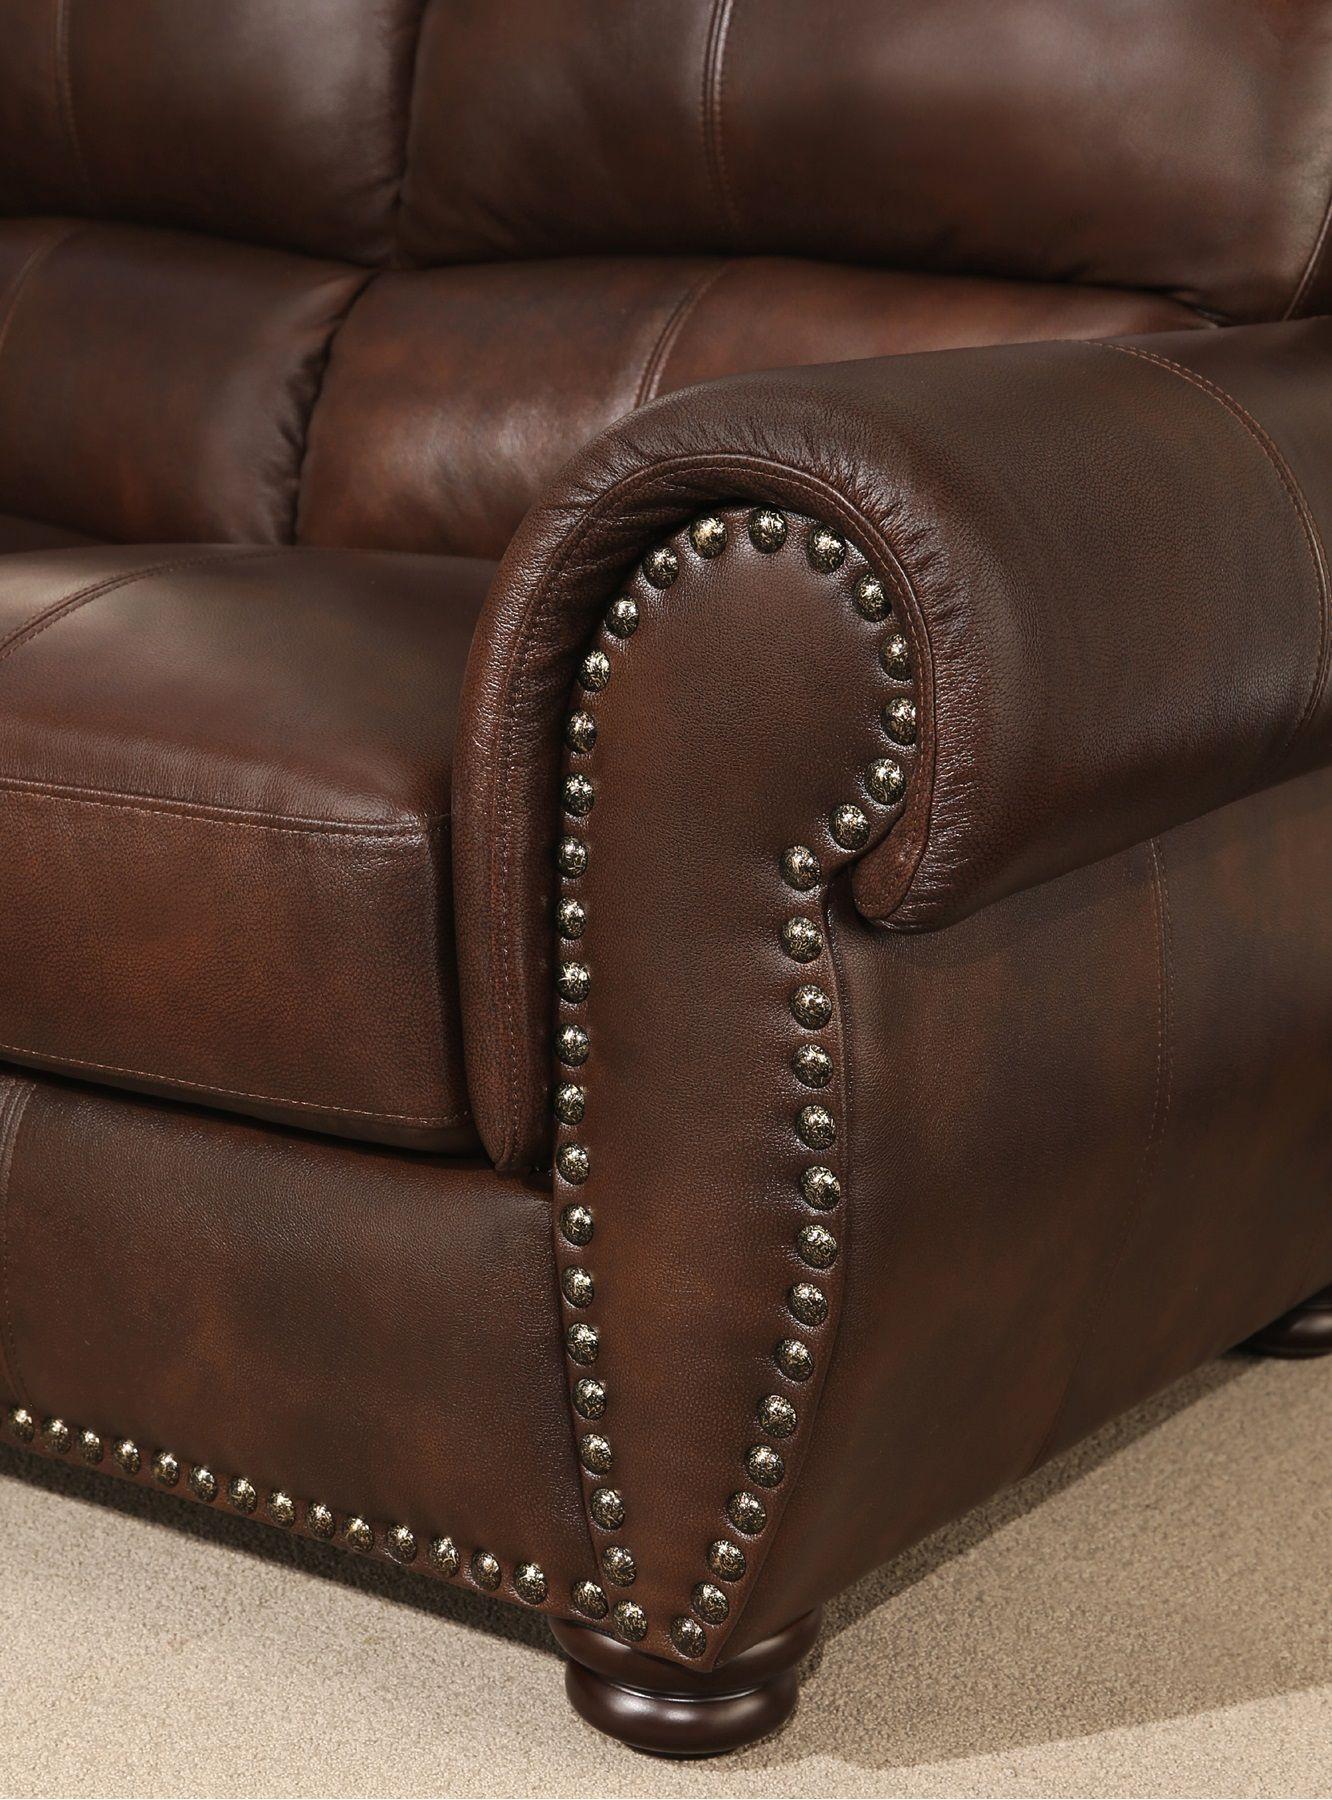 Fine Top Grain Leather Machost Co Dining Chair Design Ideas Machostcouk